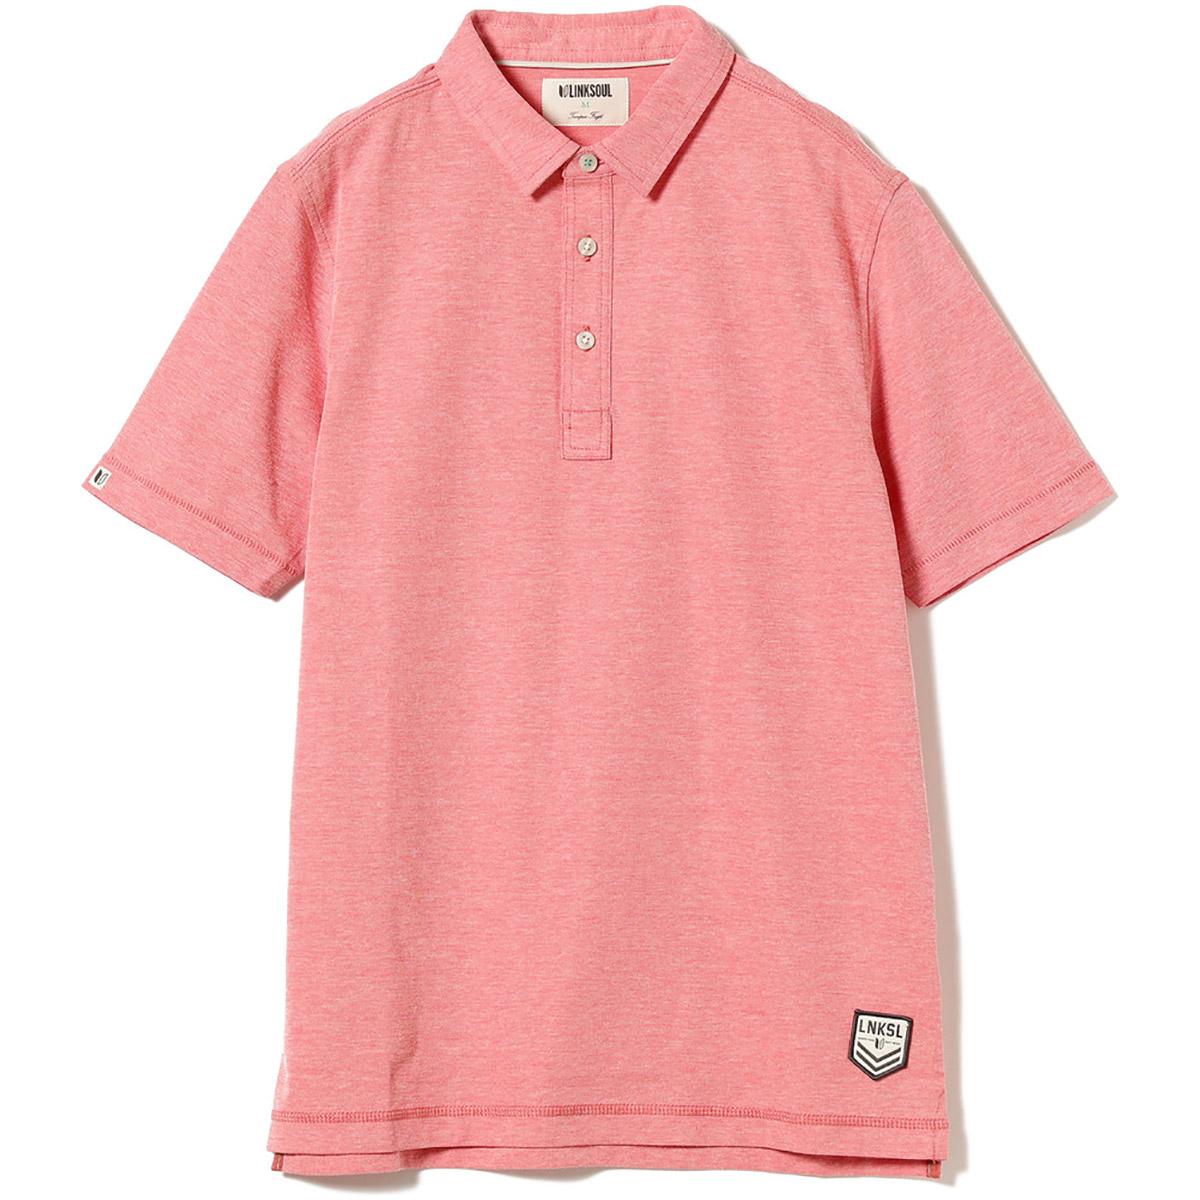 LINKSOUL×BEAMS GOLF 別注 ニット ドライテック ポロシャツ